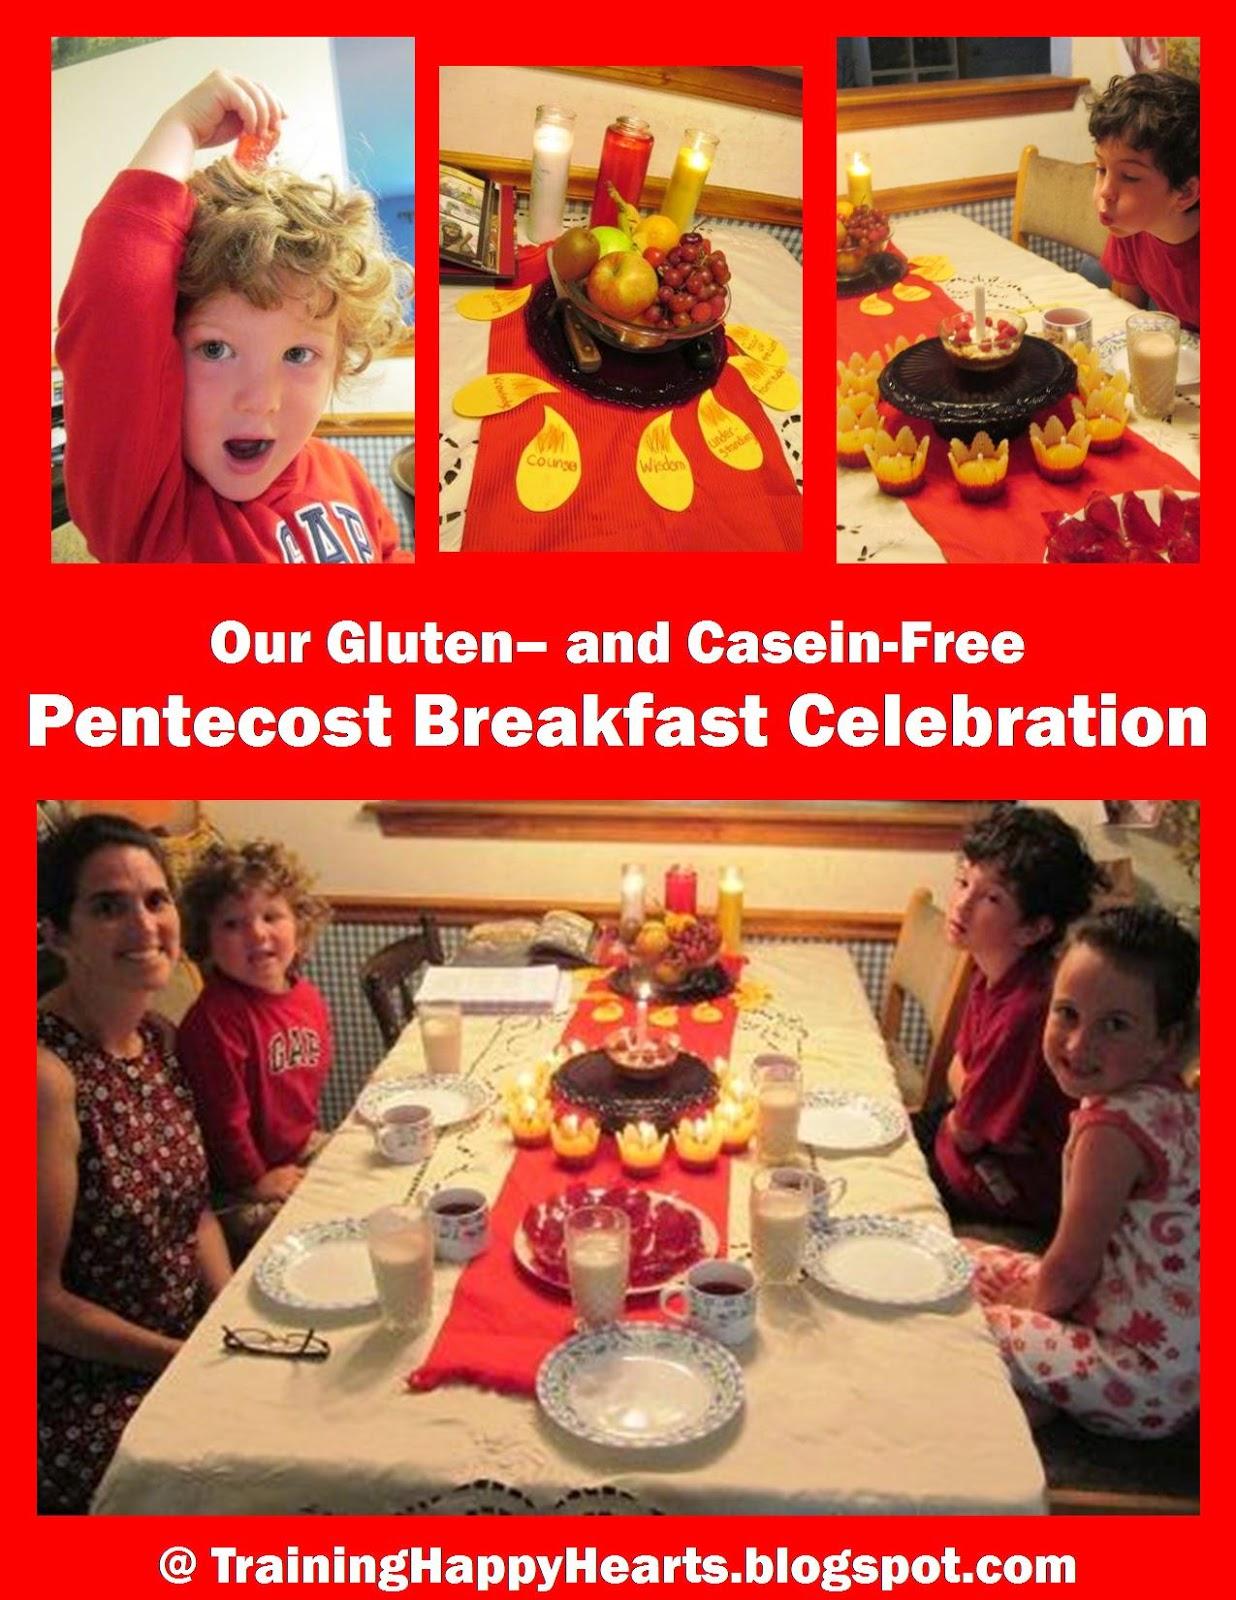 http://traininghappyhearts.blogspot.com/2014/06/our-easy-gfcf-pentecost-breakfast-tea.html